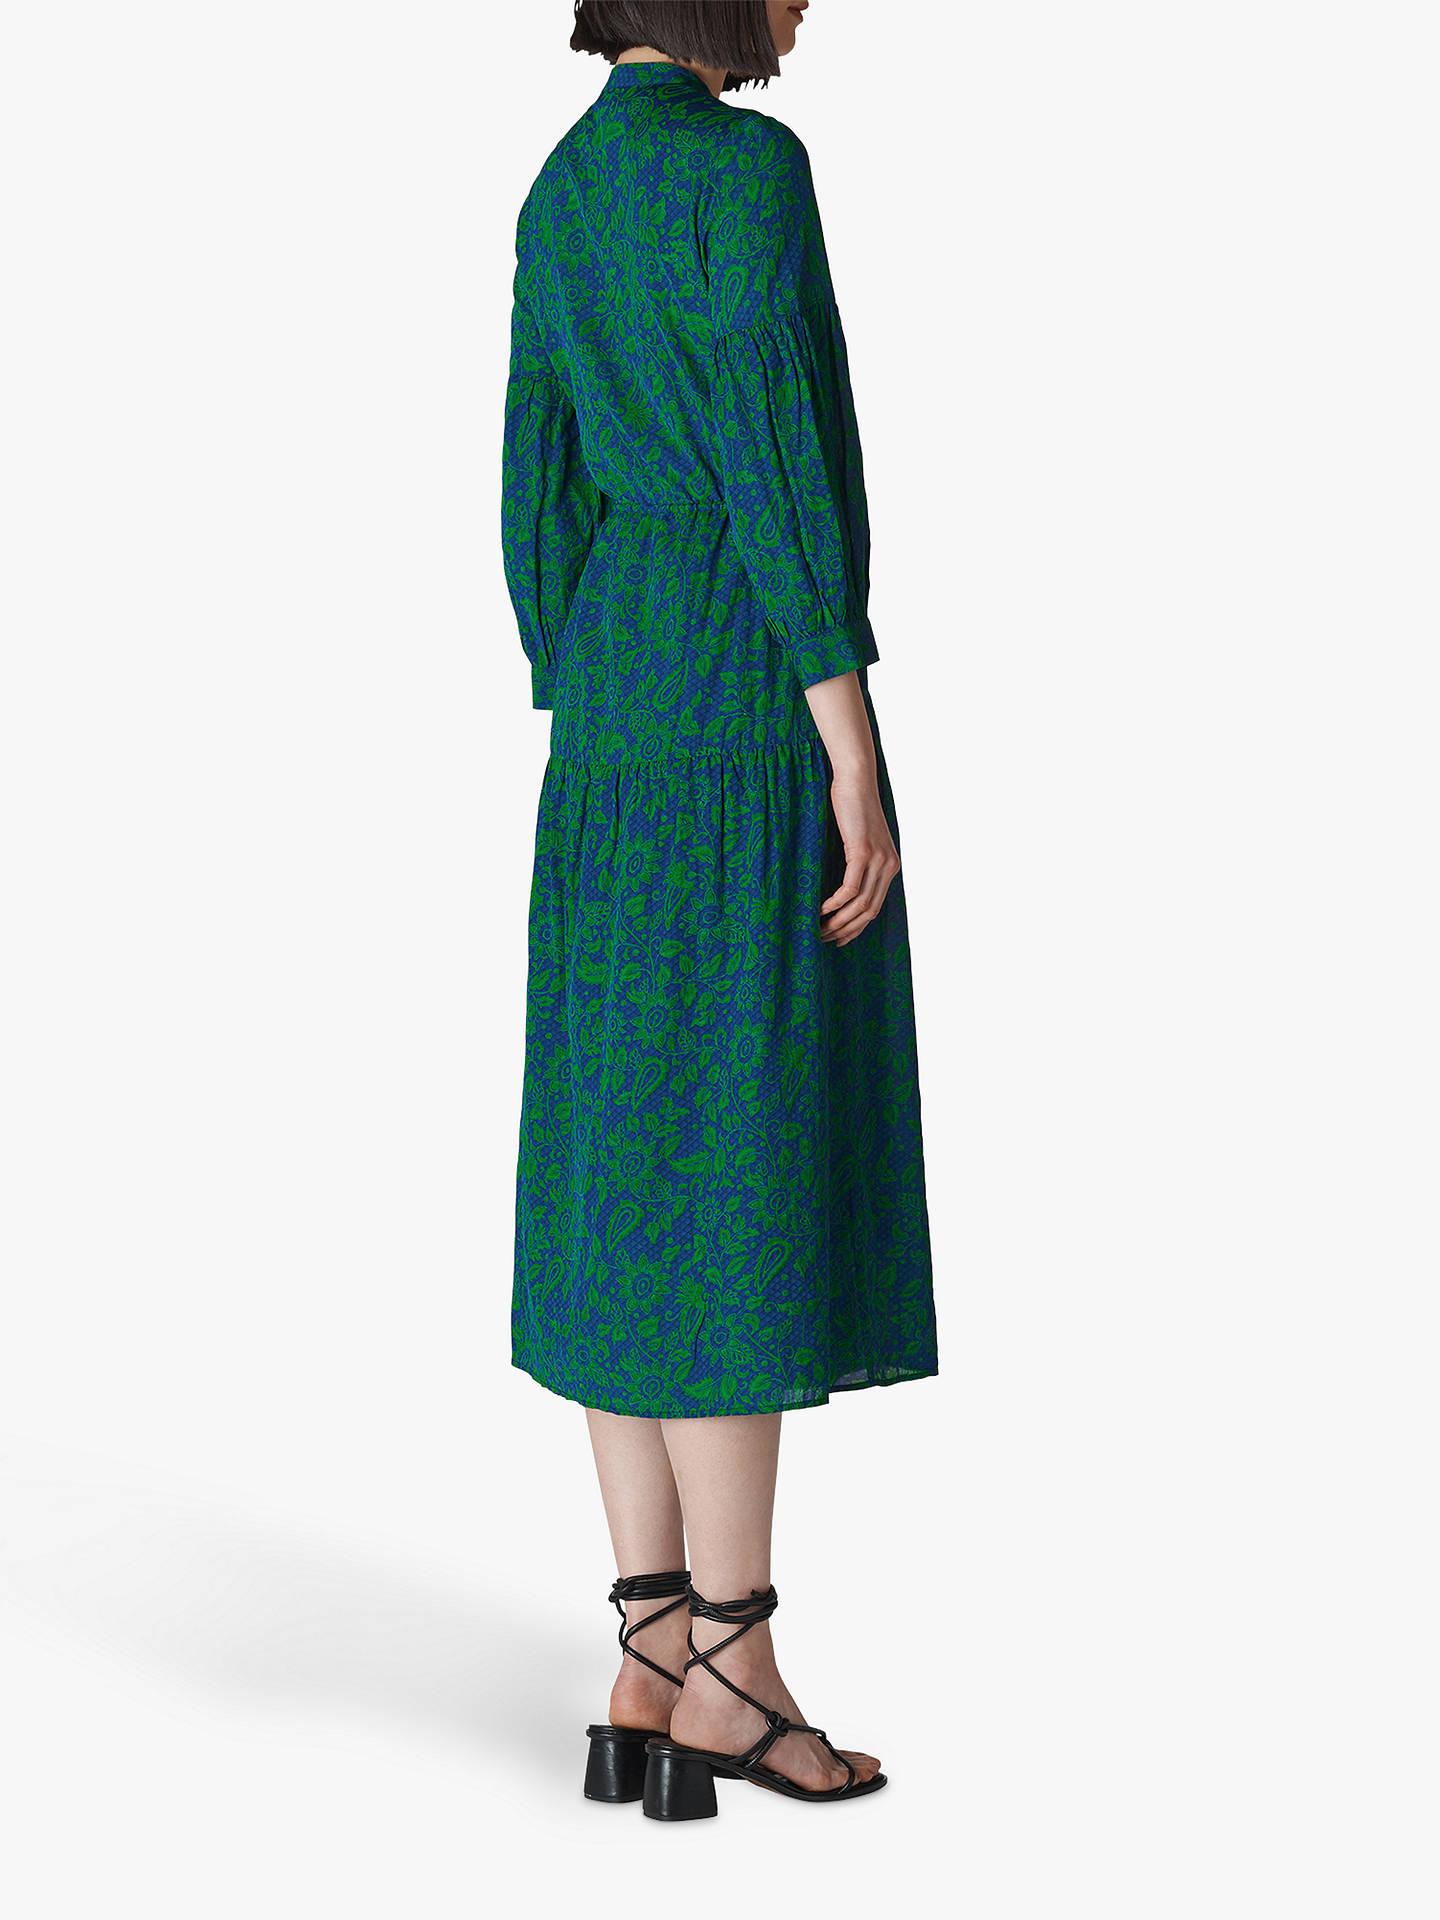 e9fece474afa ... Buy Whistles Valeria Henna Floral Print Cotton Dress, Green/Navy, 6  Online at ...